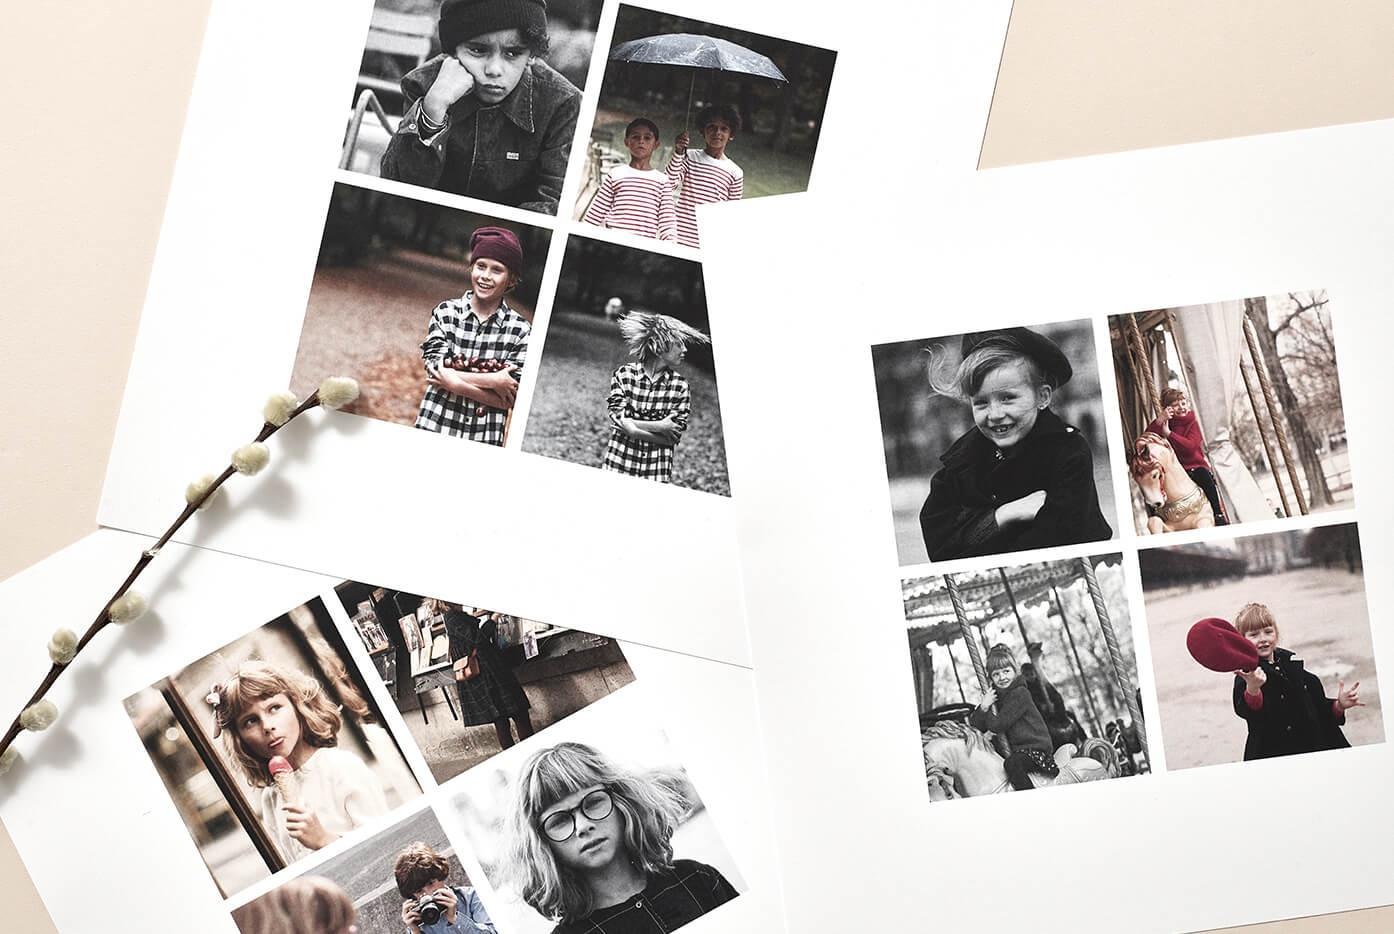 Innocence - La grille Insta - Tirage photo - Poster mosaique Instagram